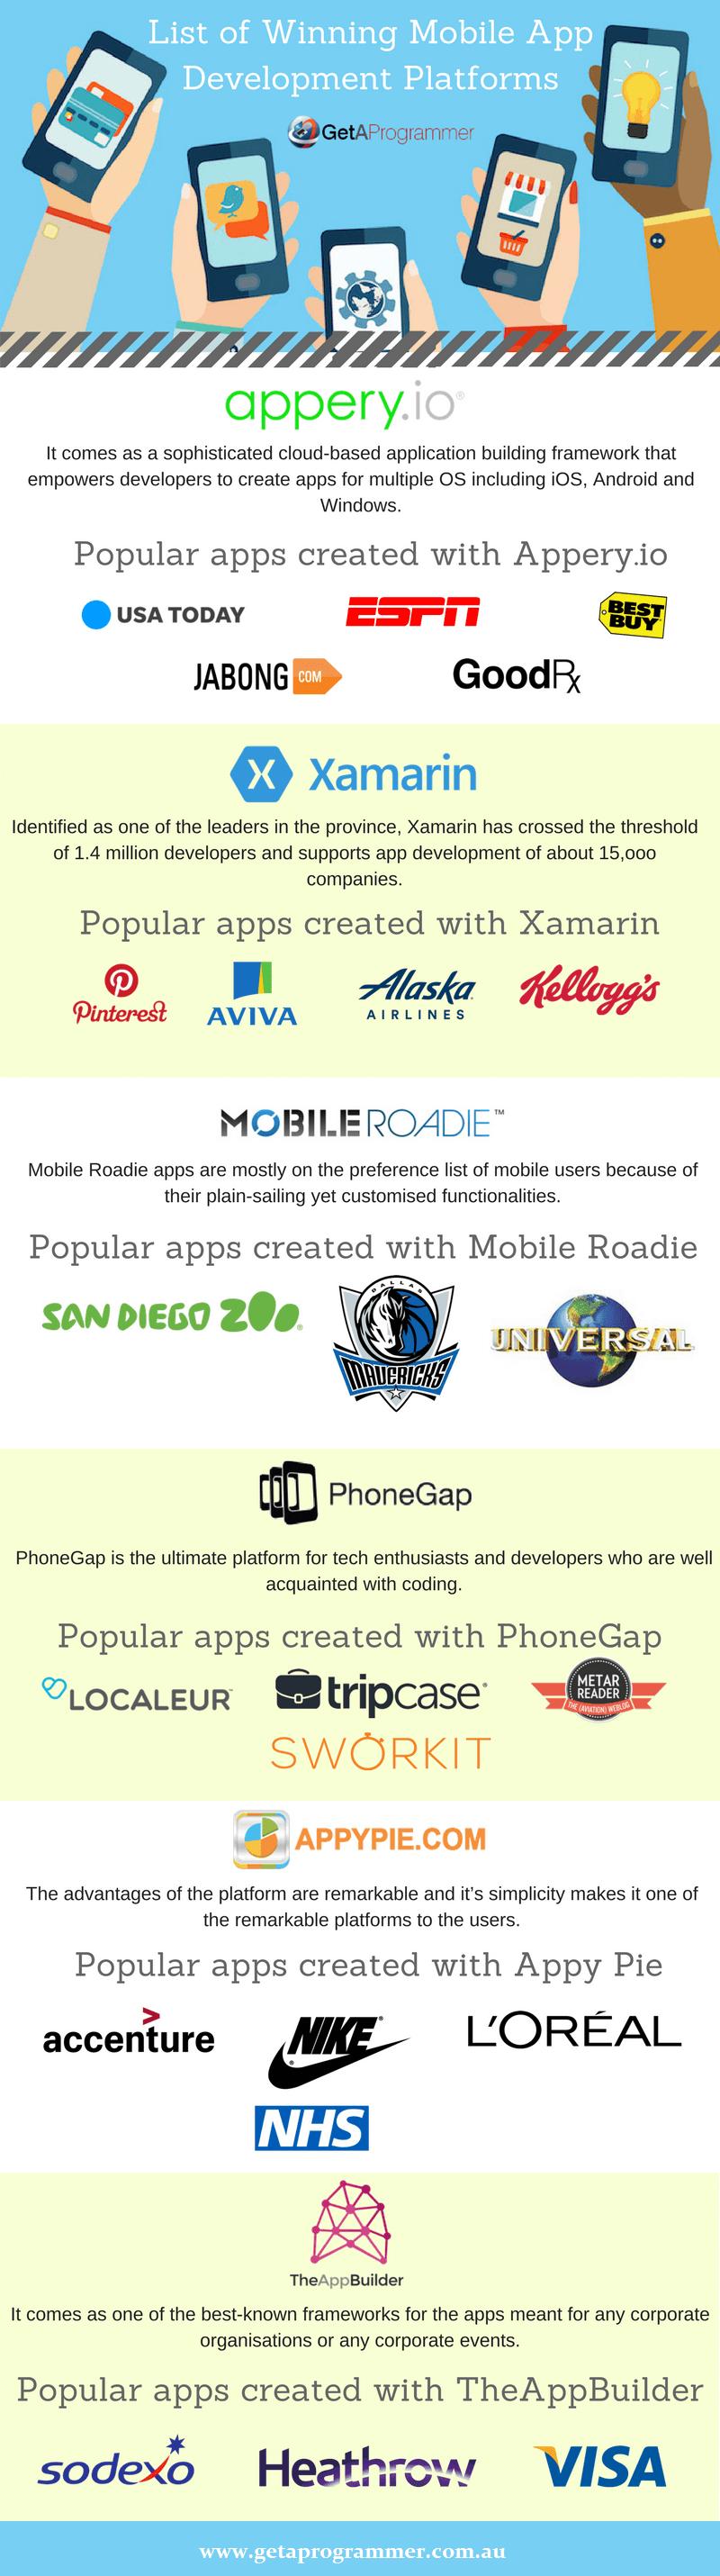 Mobile App Development Platforms Infographic